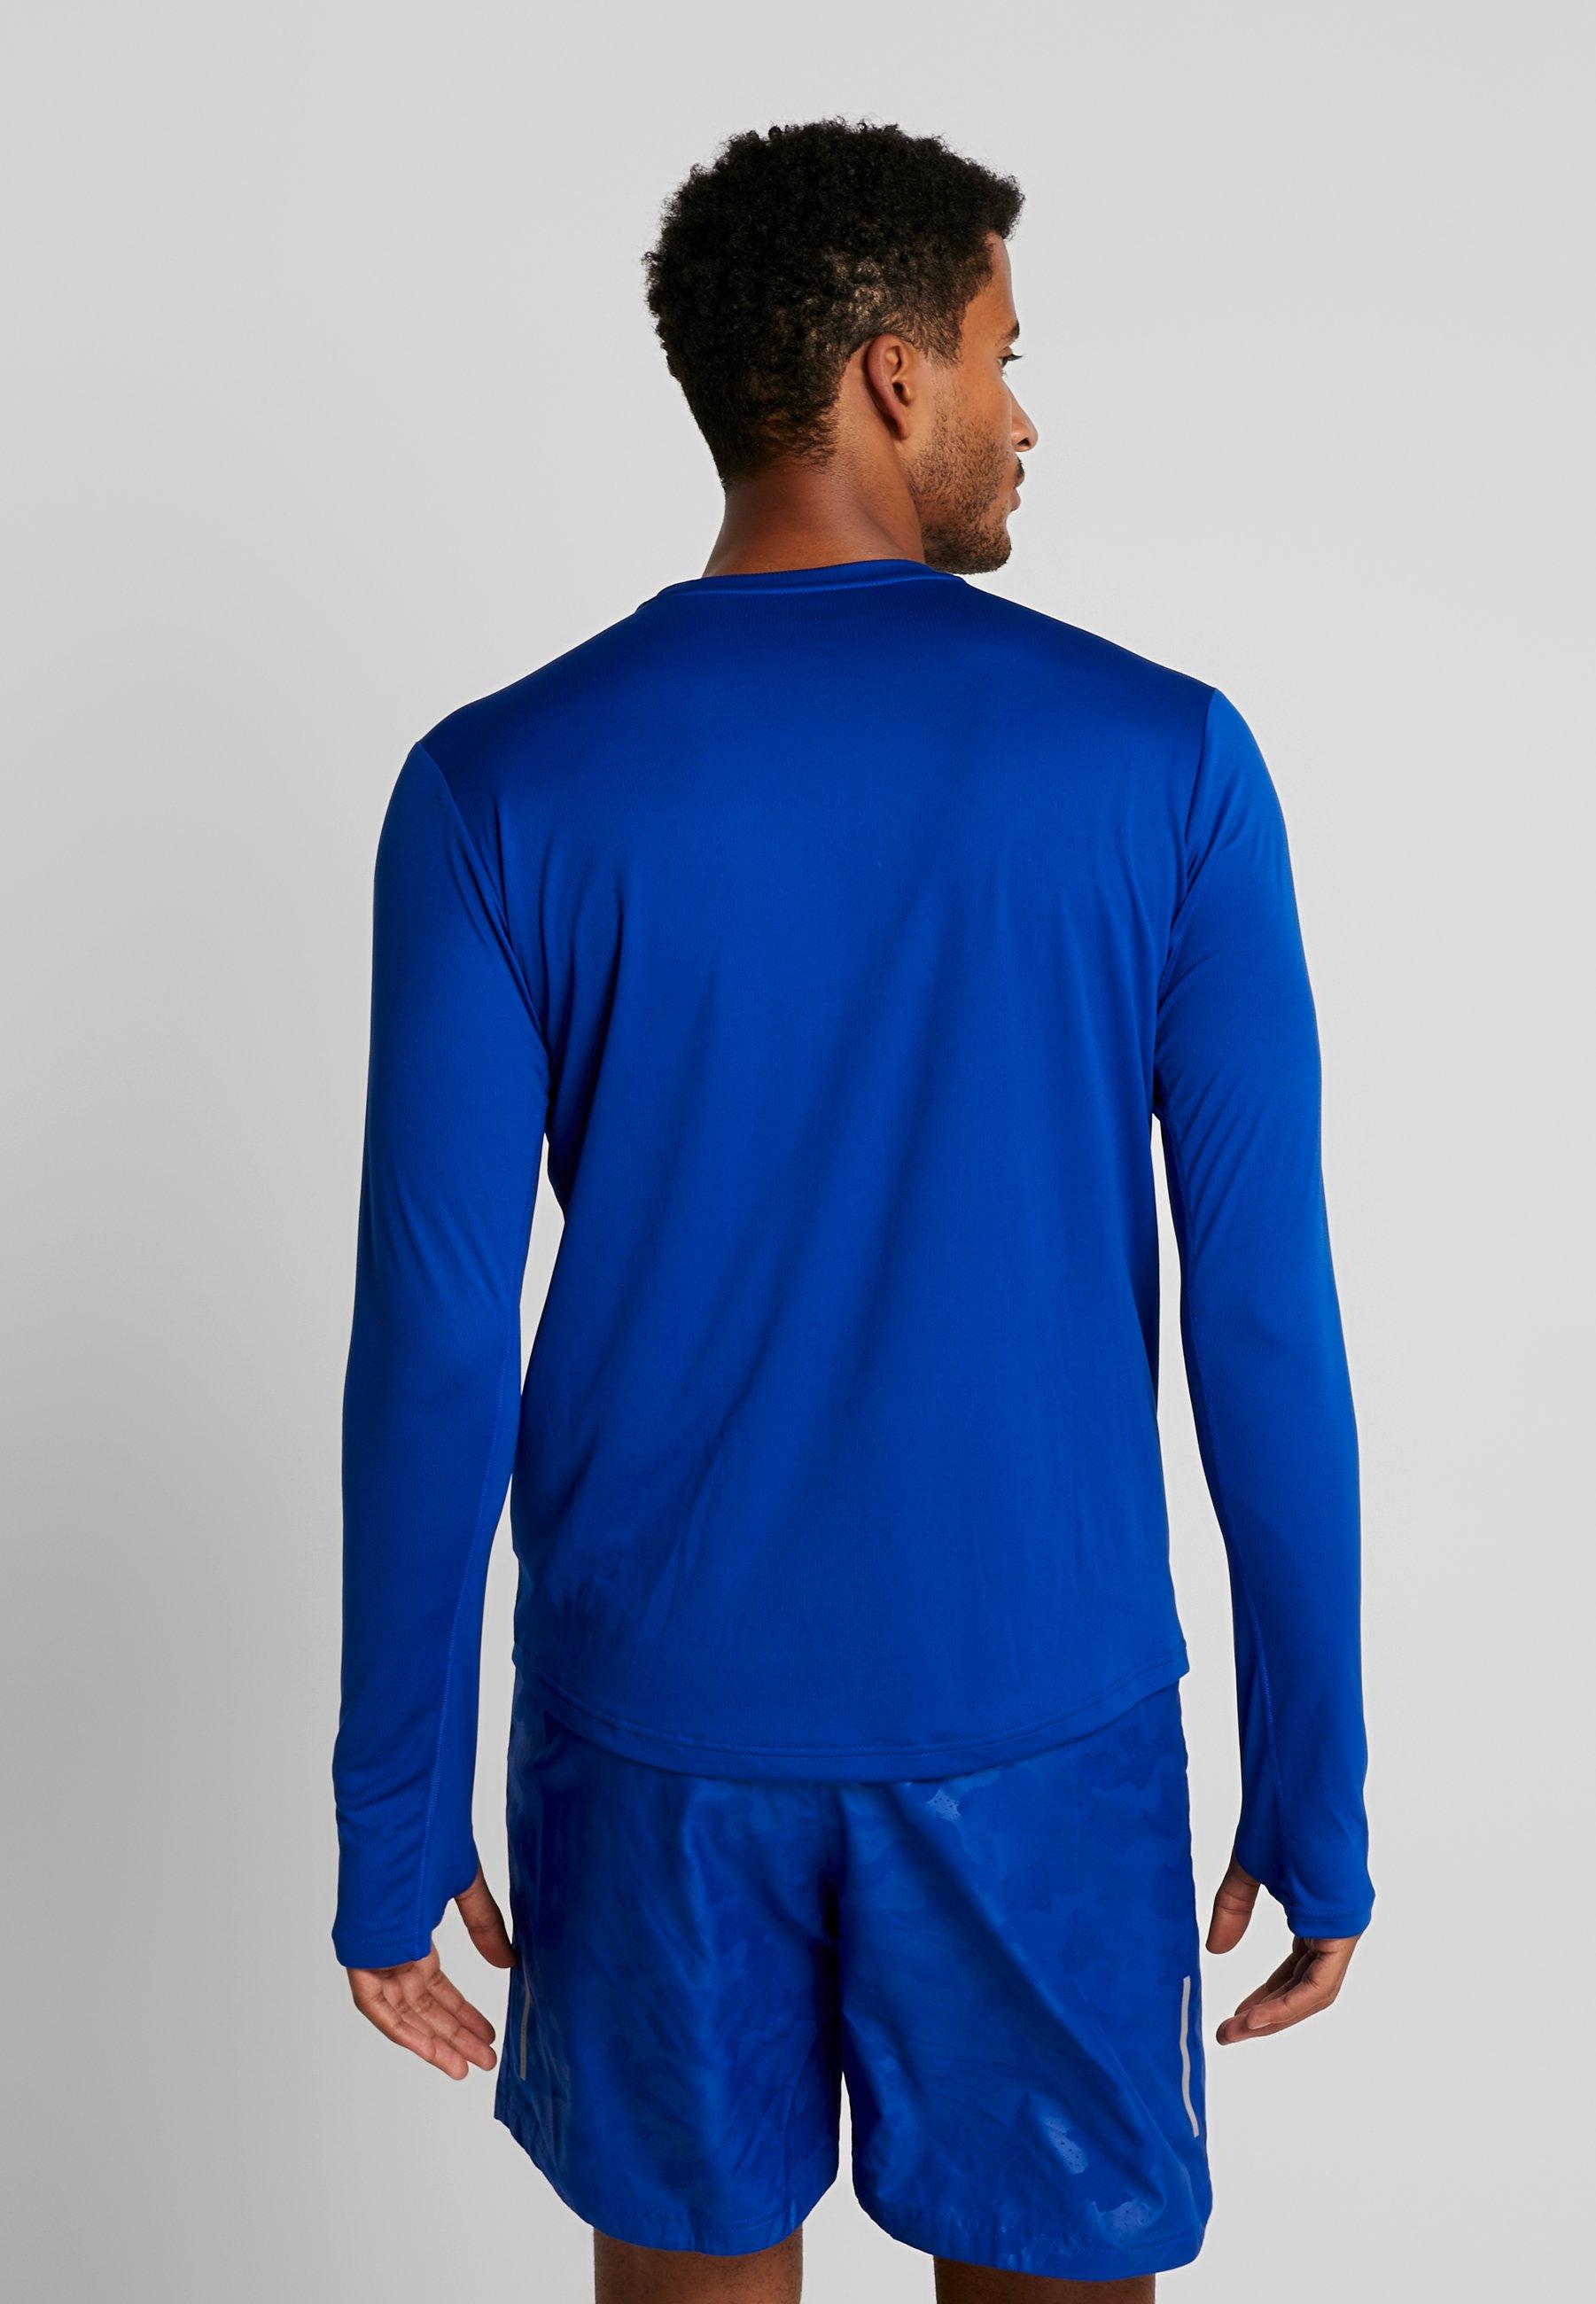 Adidas Longues Croyal Performance The Manches Own shirt À RunT 8nOkXP0Nw